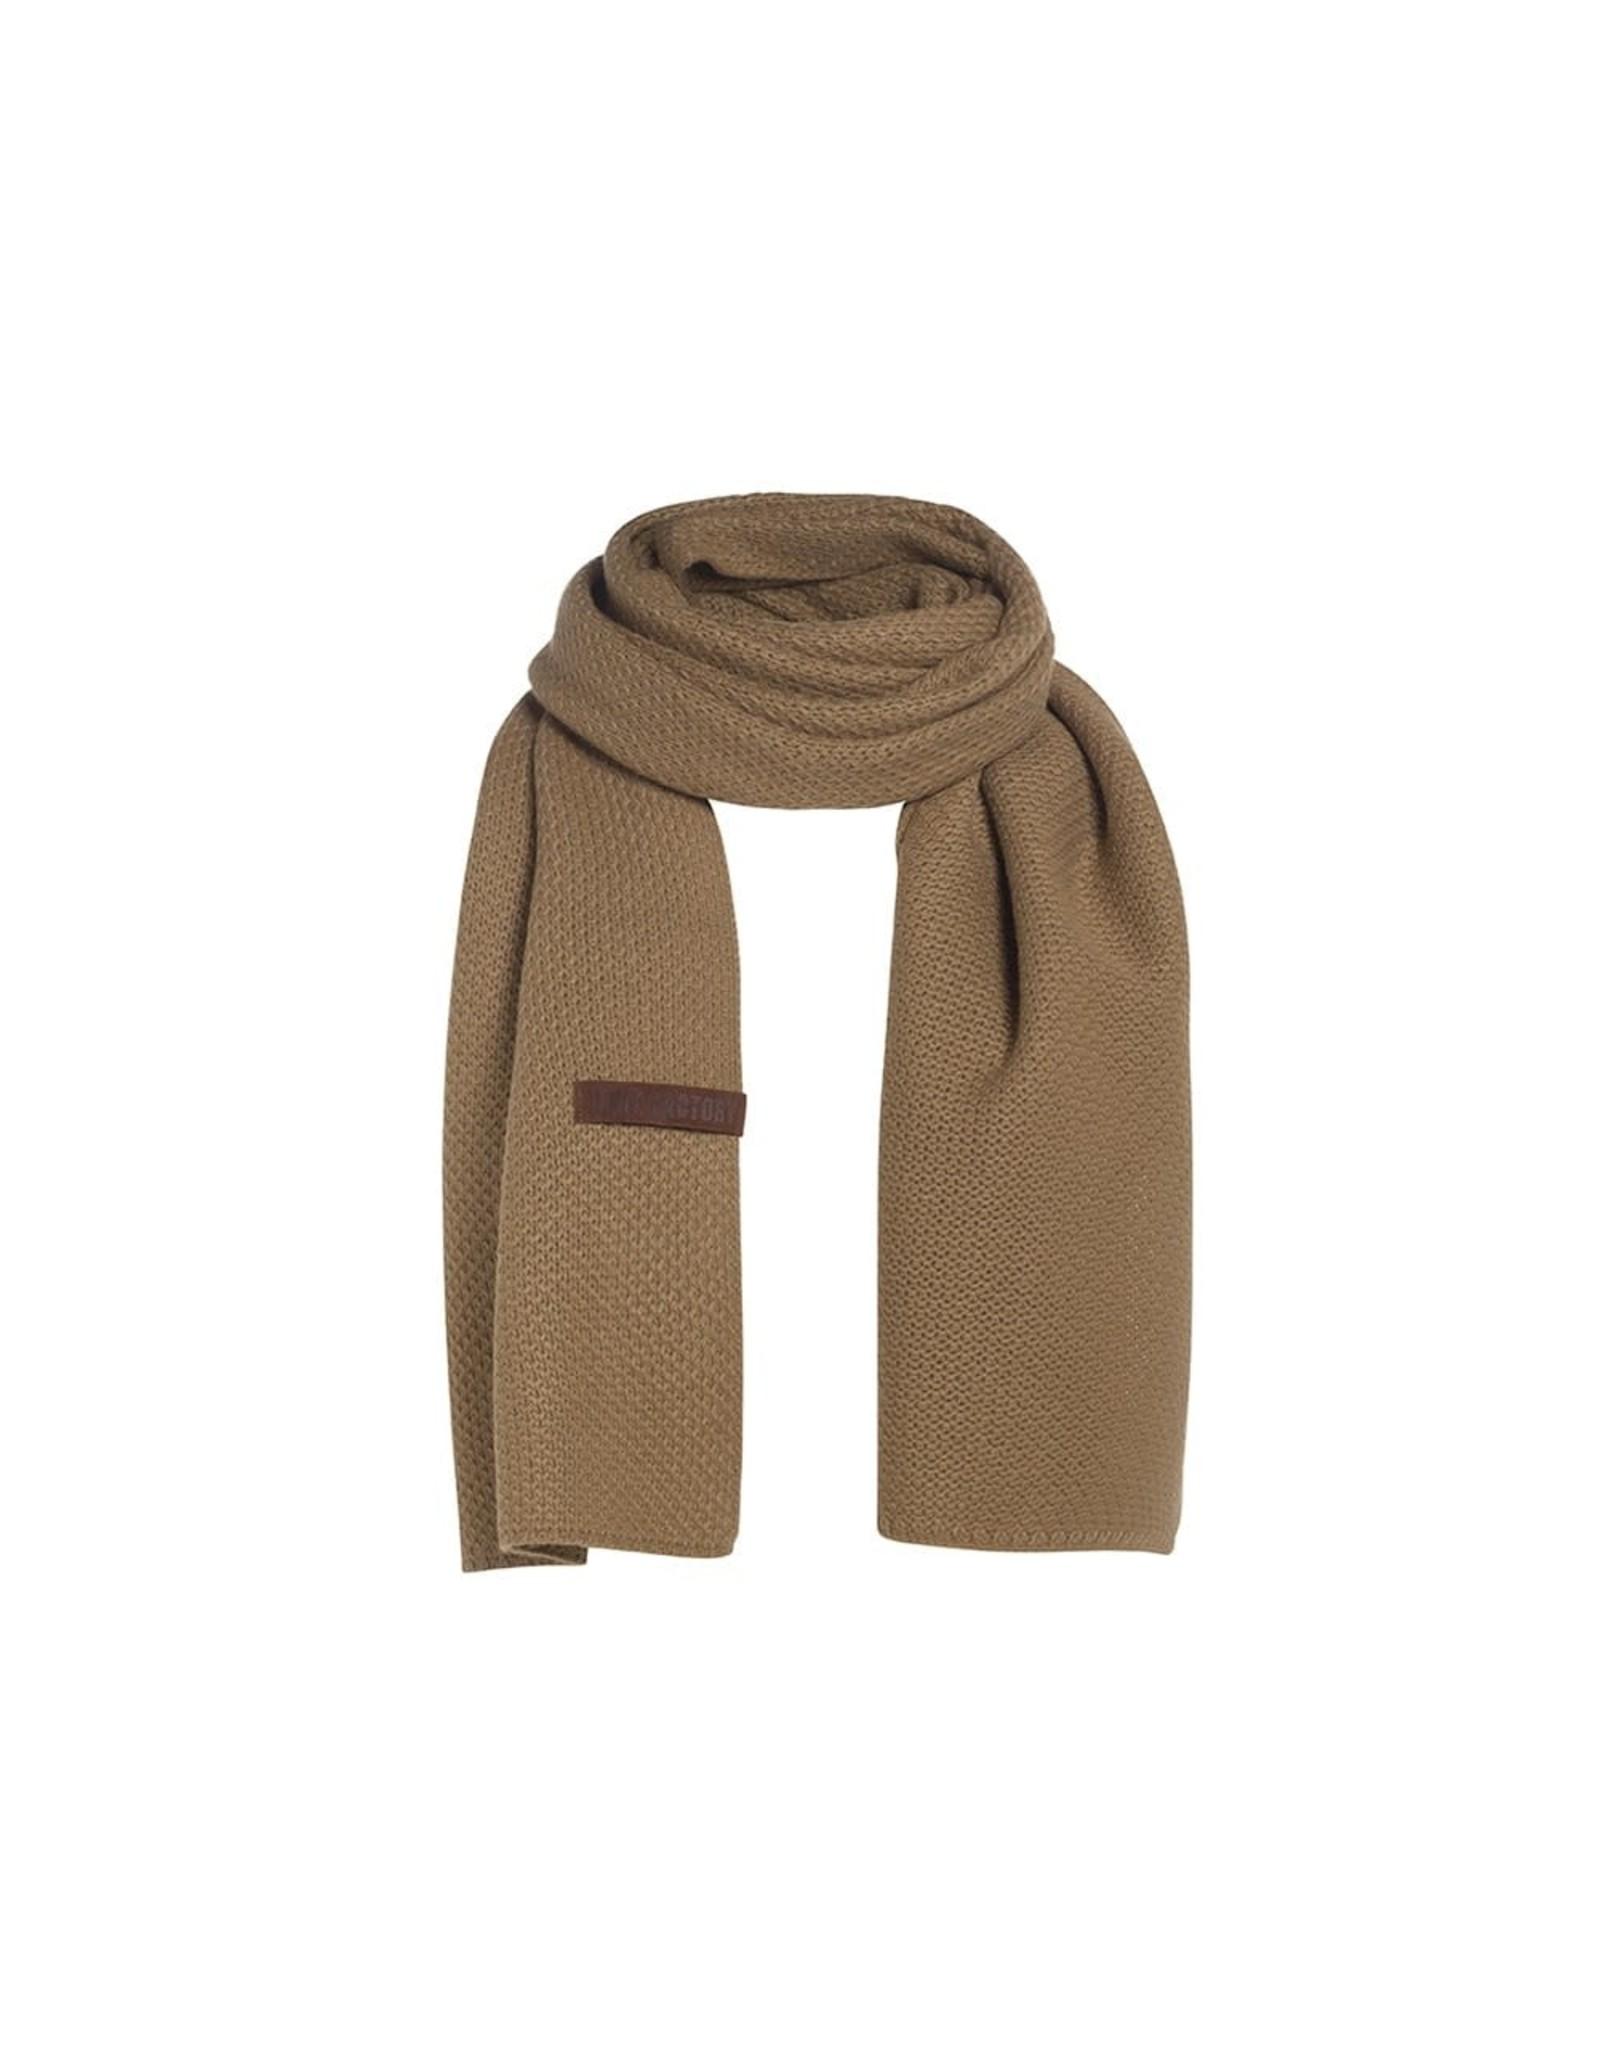 Knit Factory Knit Factory 1236520 Jazz Scarf 200x30 New camel